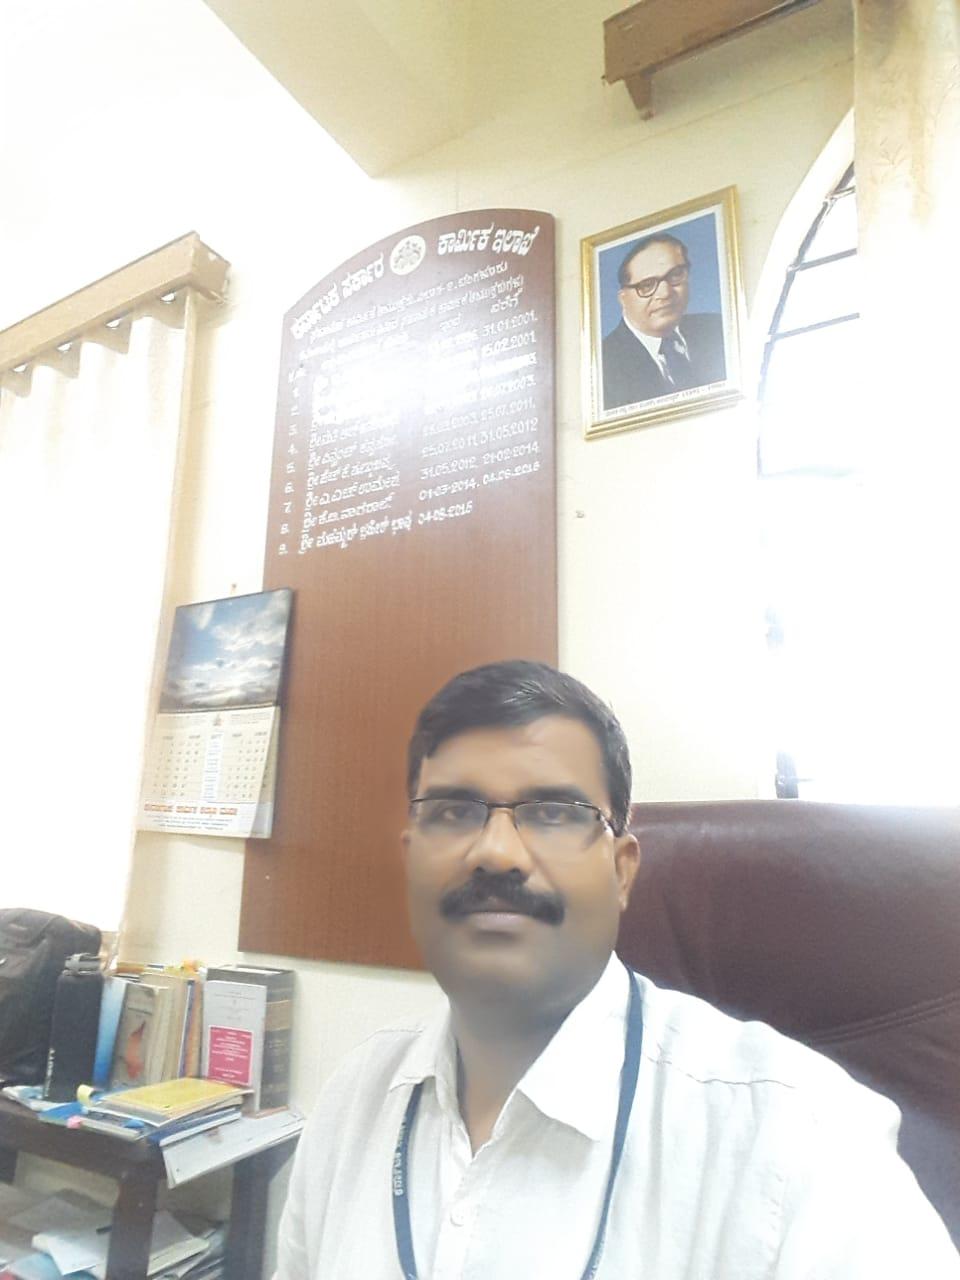 https://karmikaspandana.karnataka.gov.in/storage/pdf-files/images/SOMANNA.jpeg